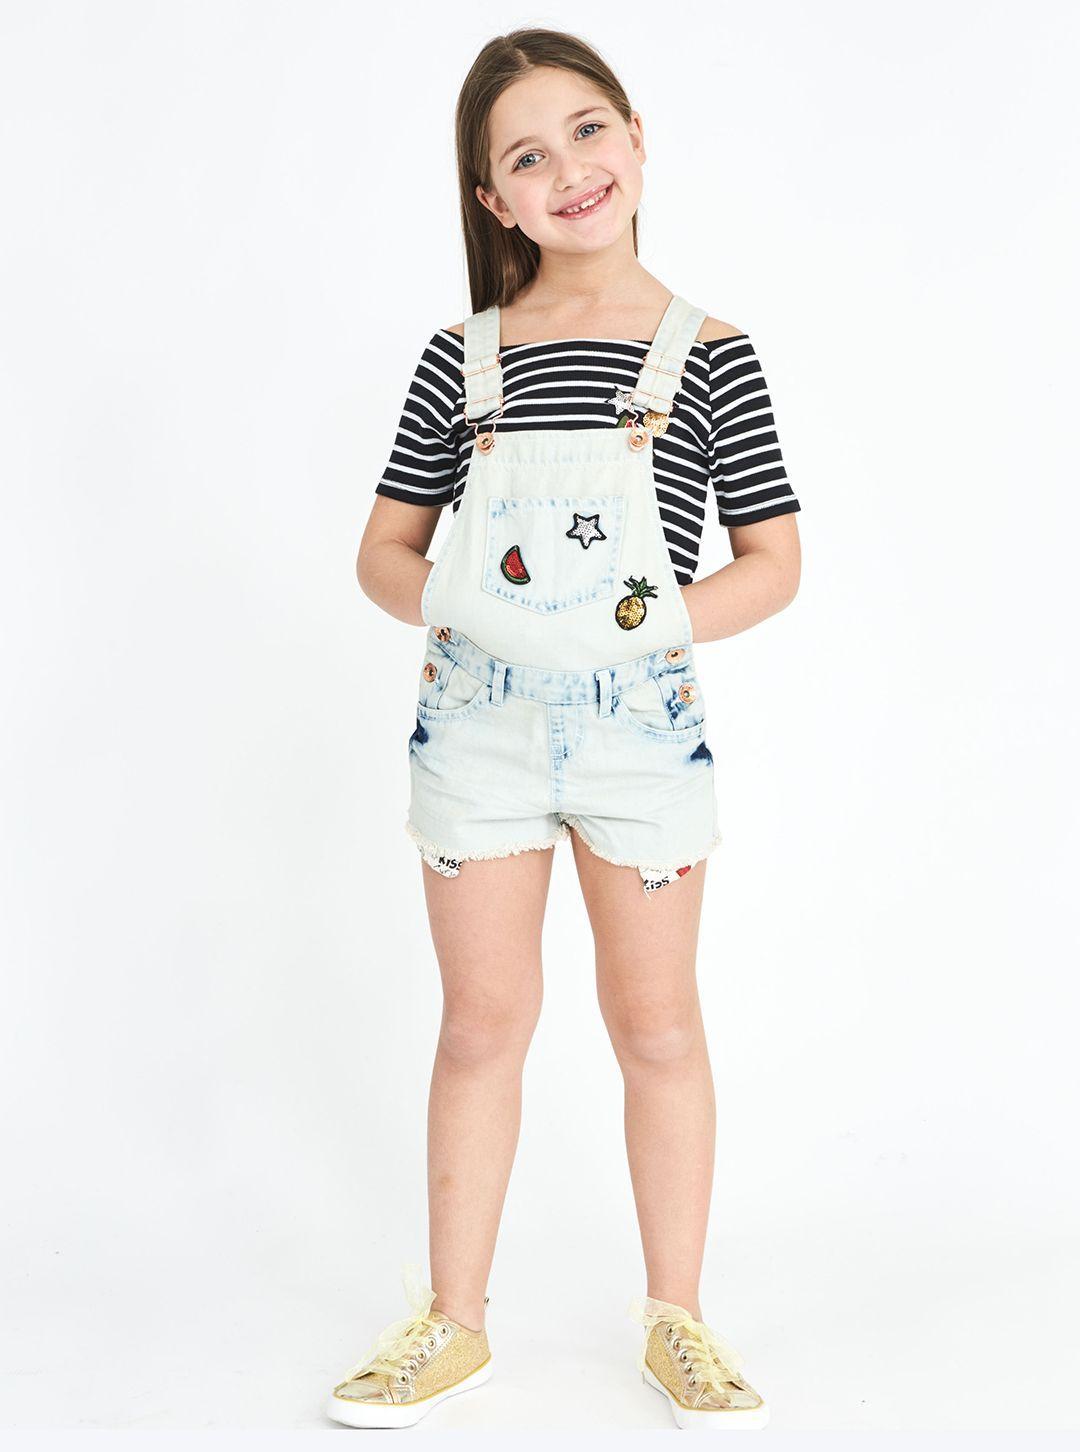 #kids #girl #pinterest #pinit #short #salopette #patch #piazzaitalia